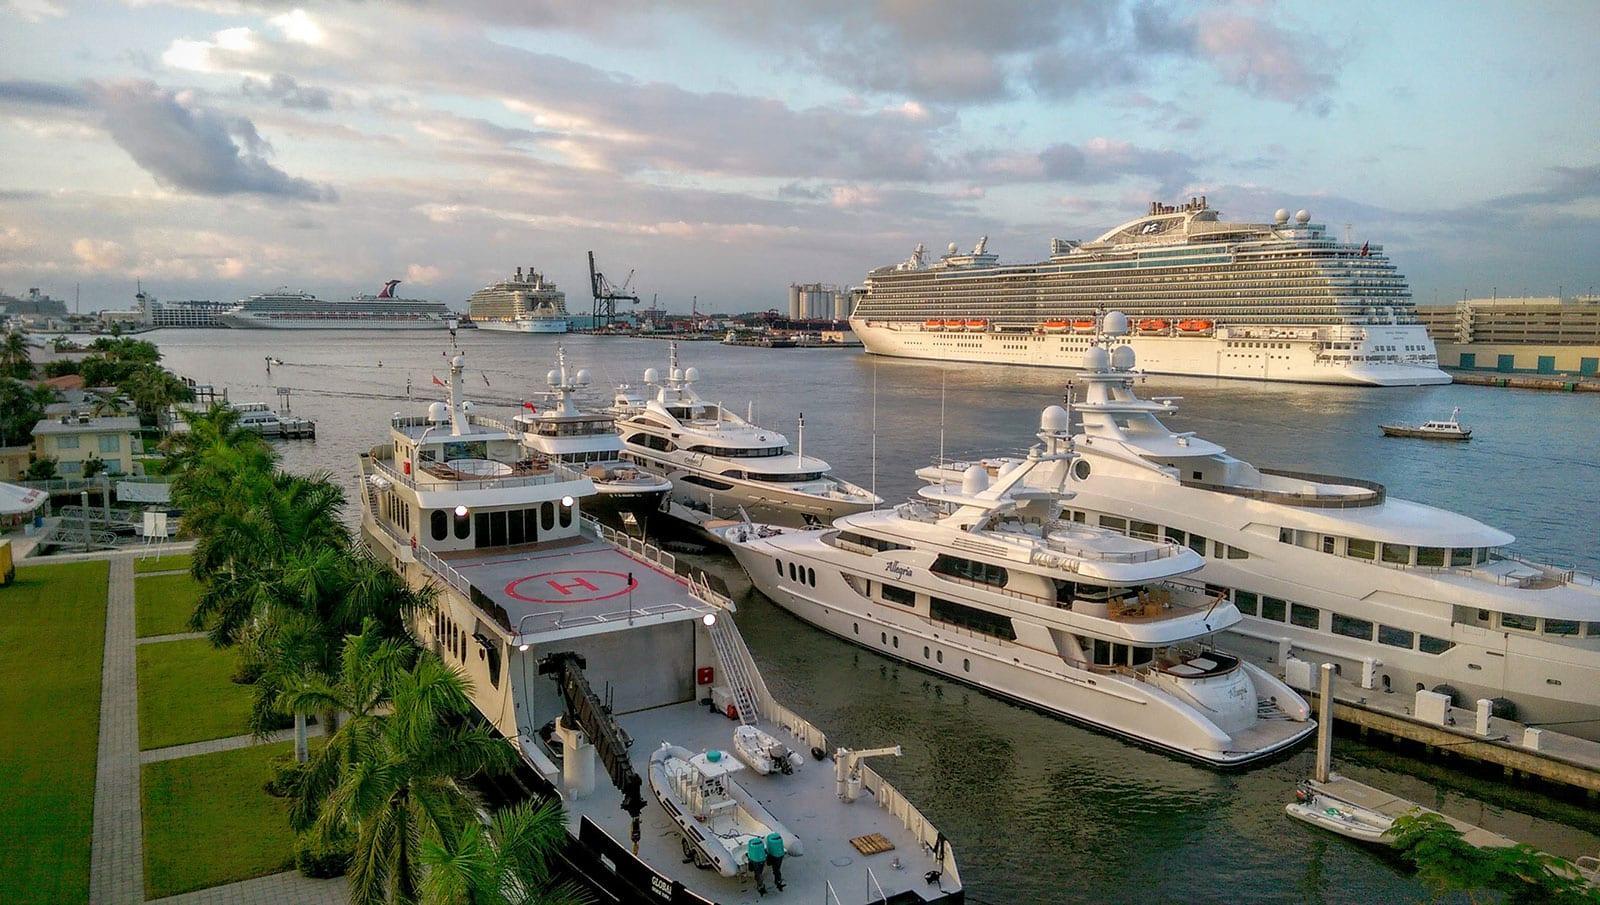 Fort_Lauderdale6